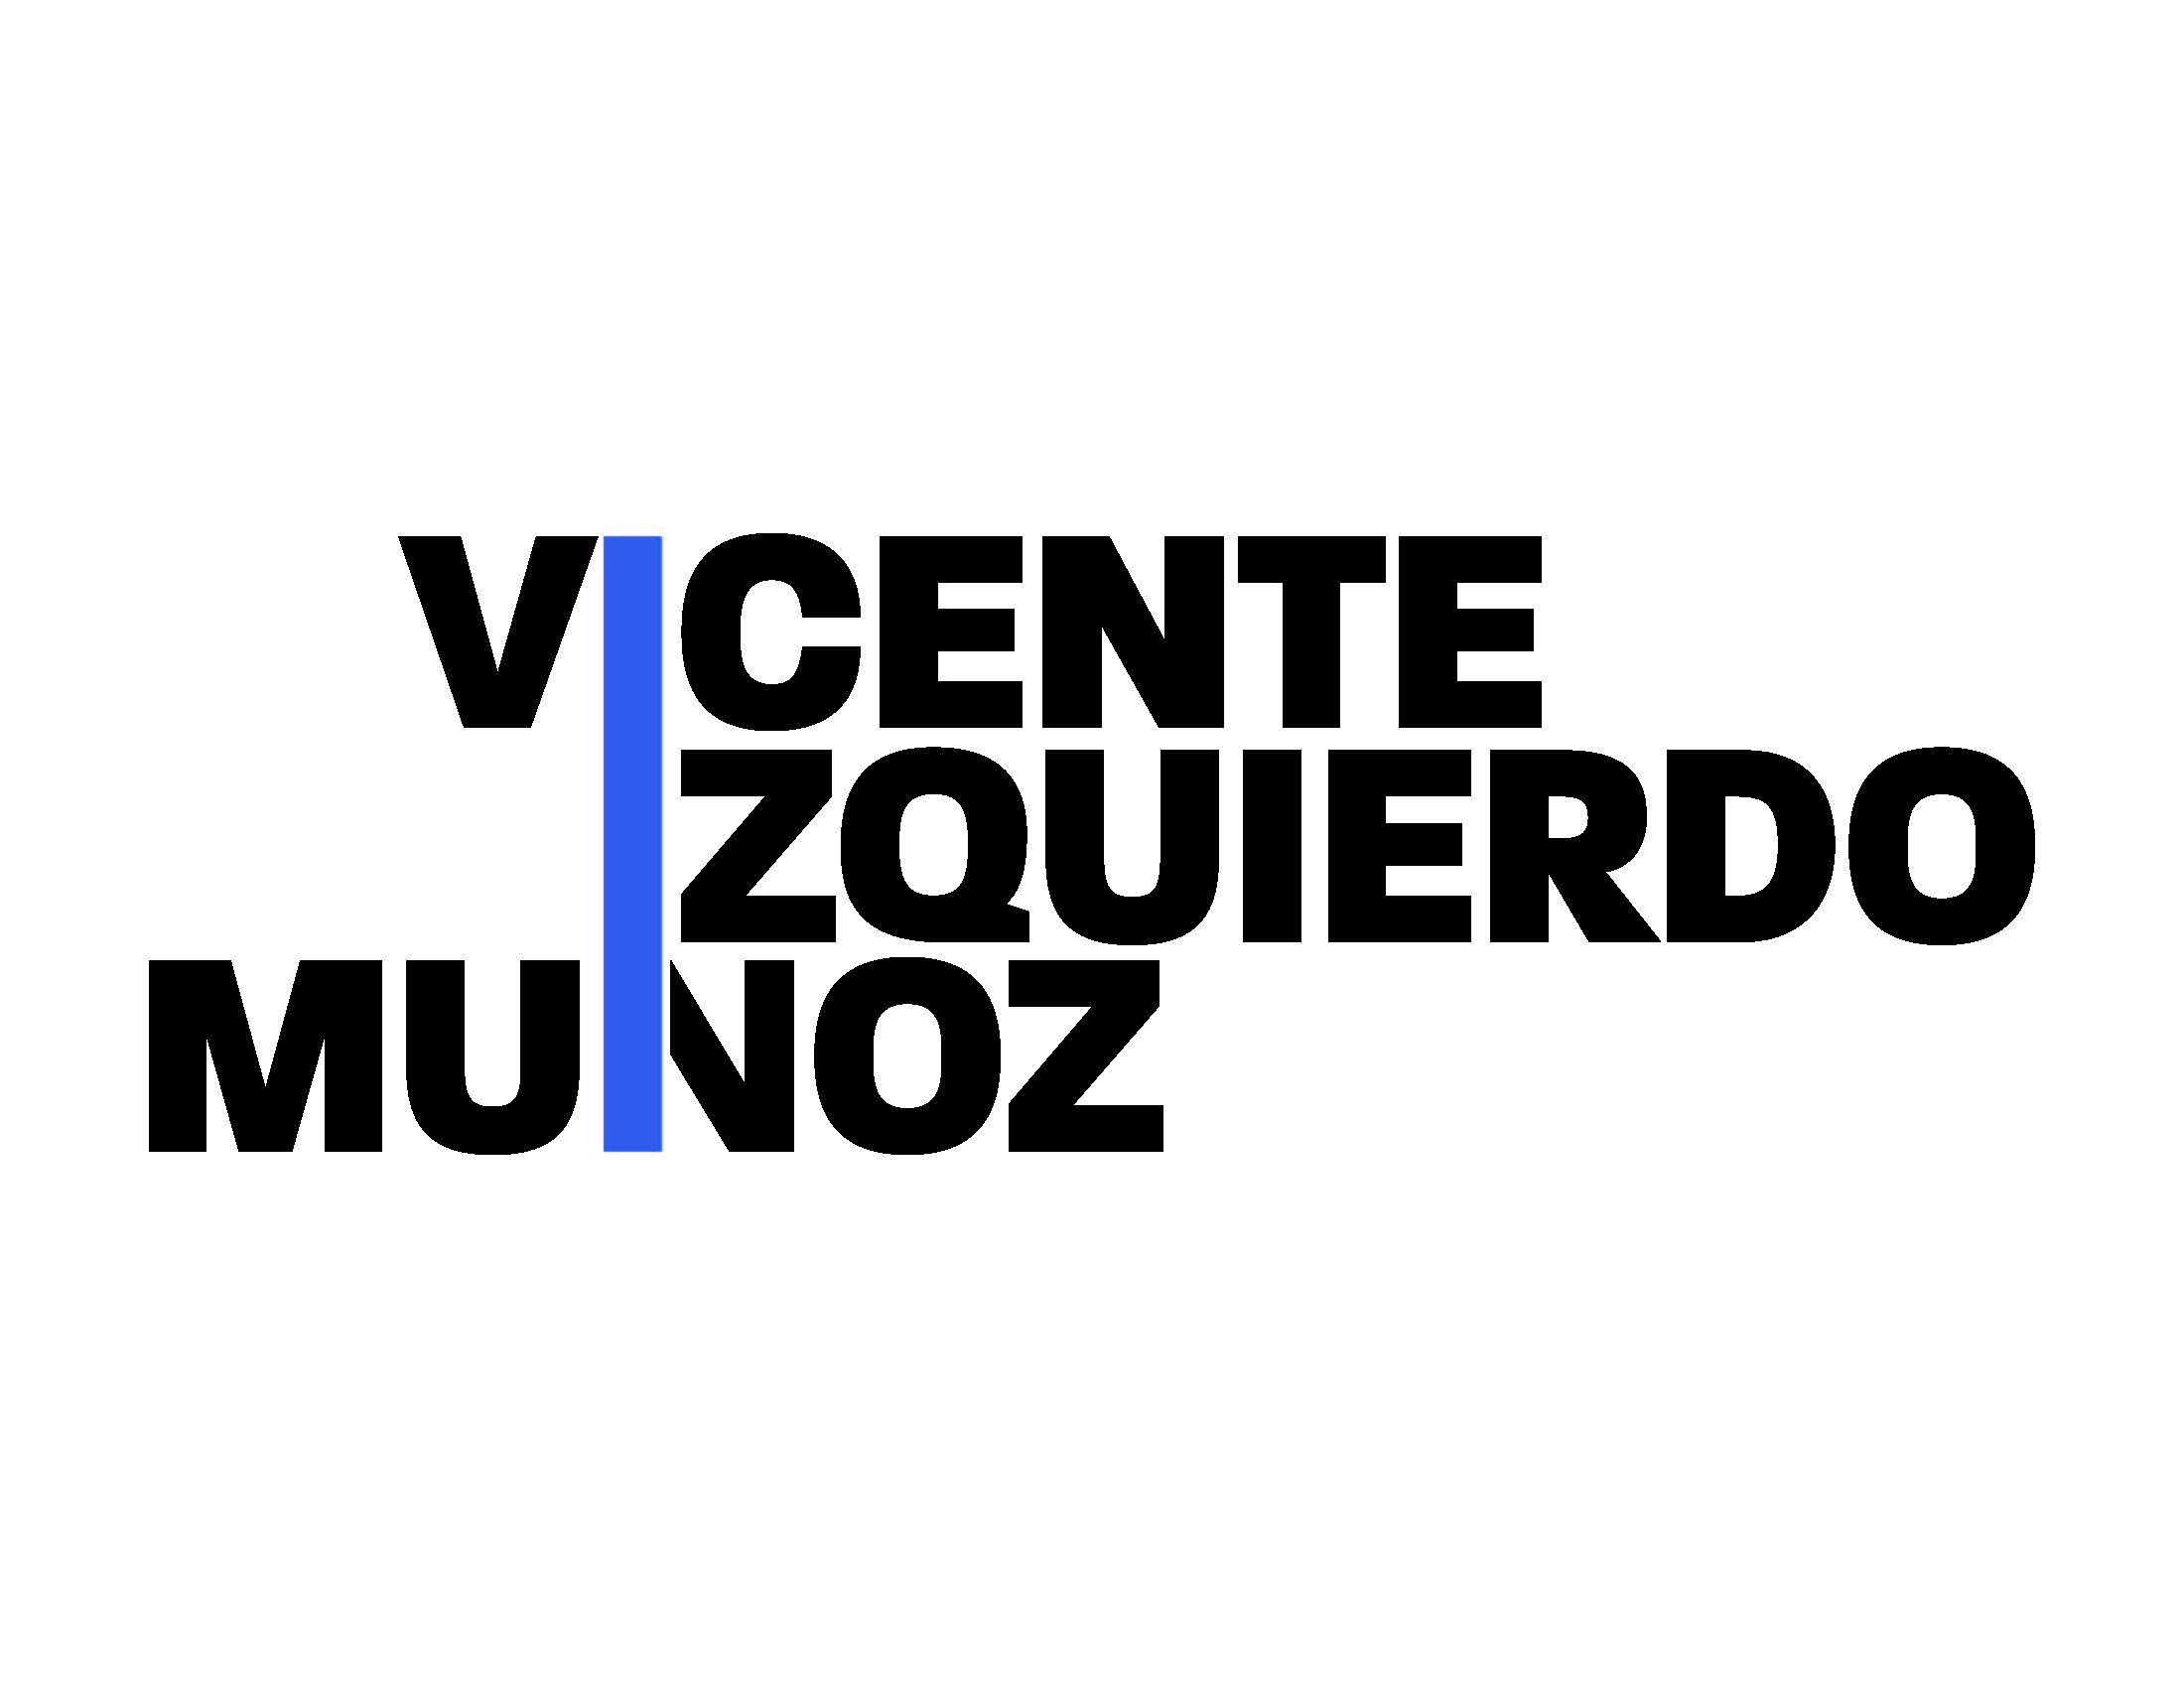 http://vicenteizquierdomunoznews.com